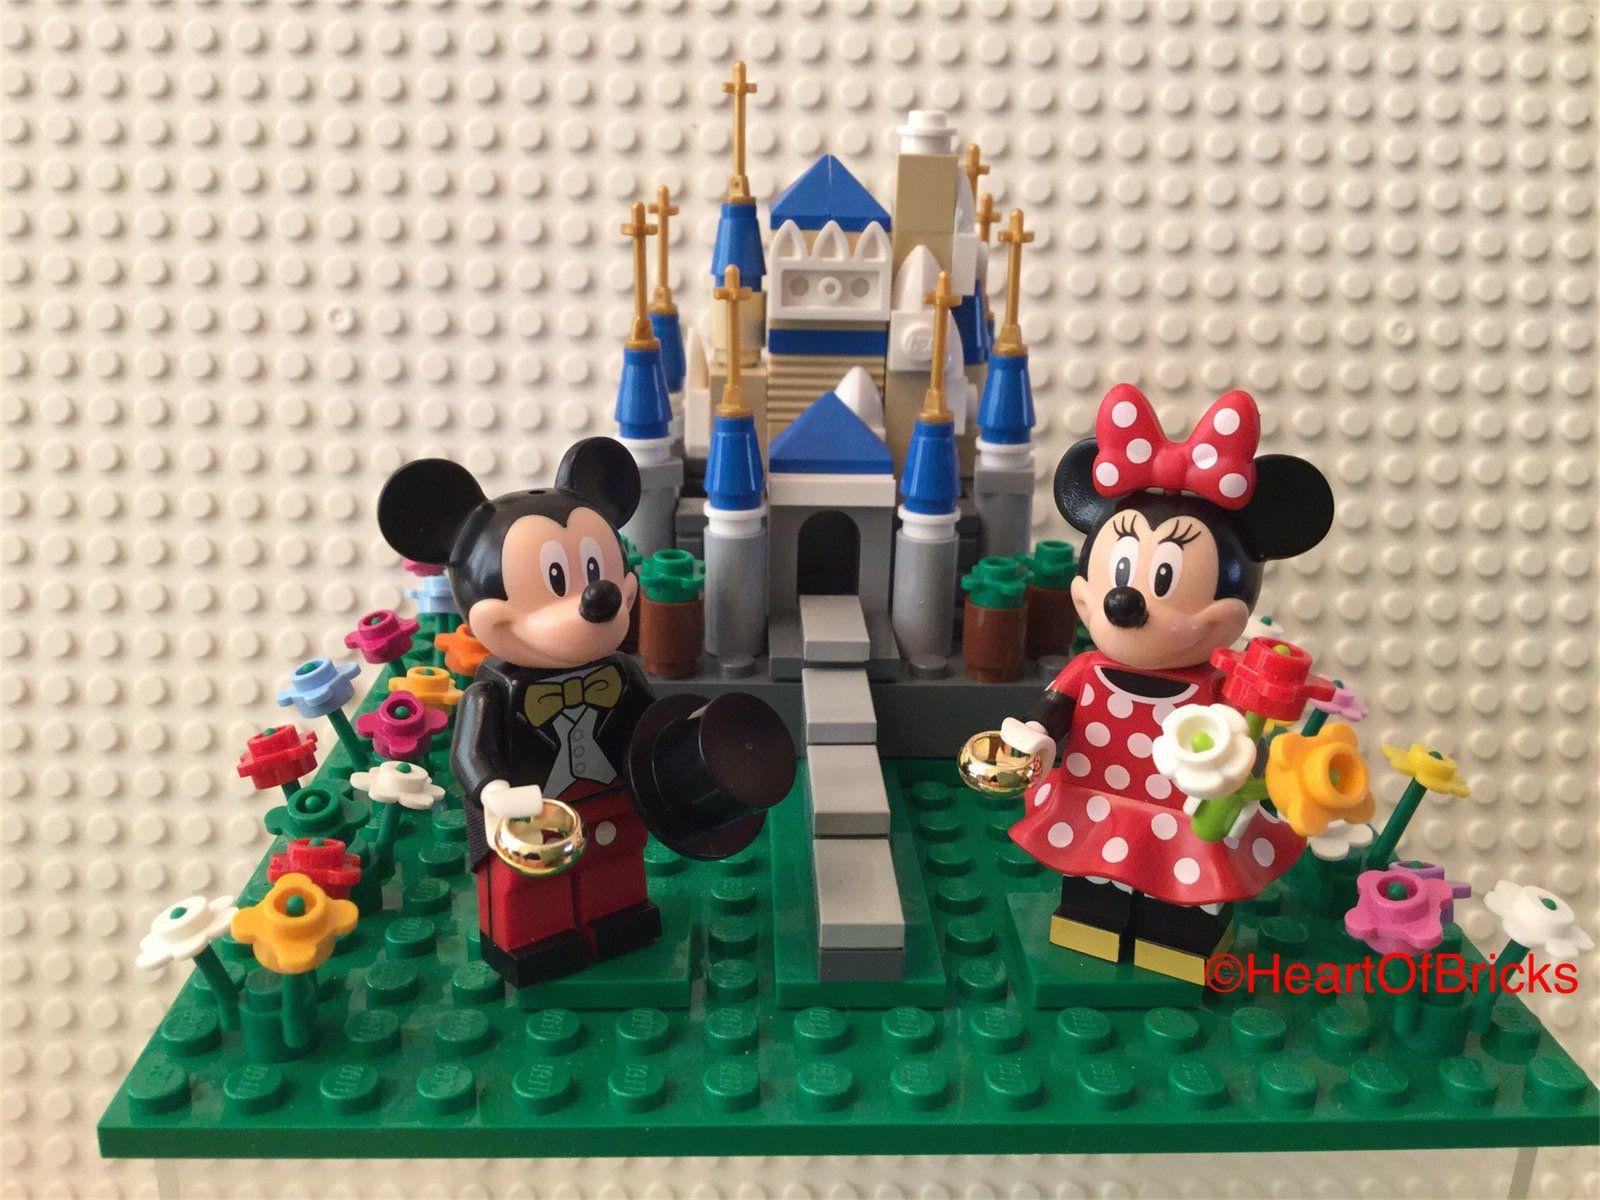 Disney Themed Cake Topper Weddings Birthdays Castle With